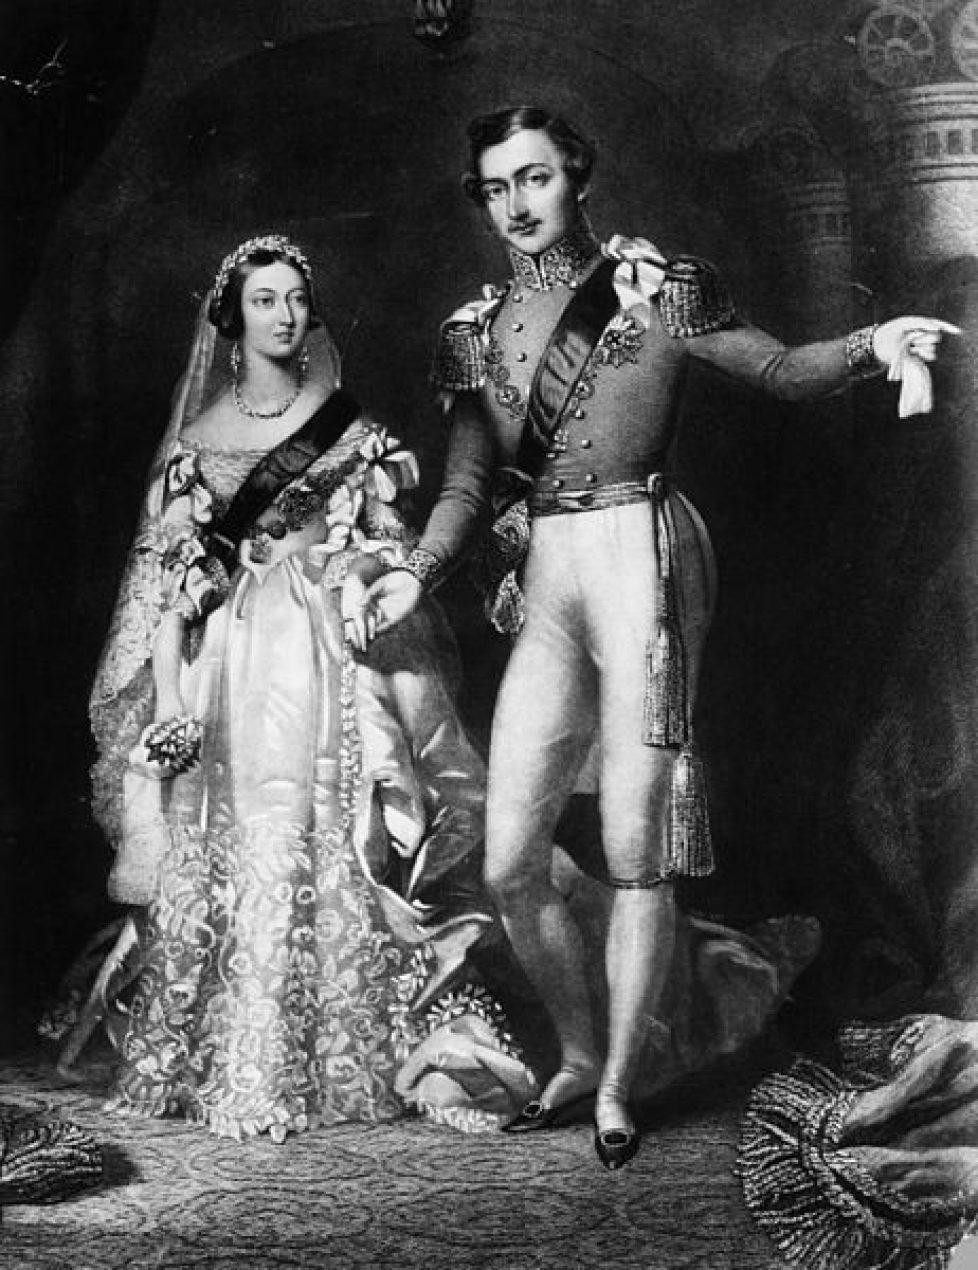 Wedding of Victoria and Albert -